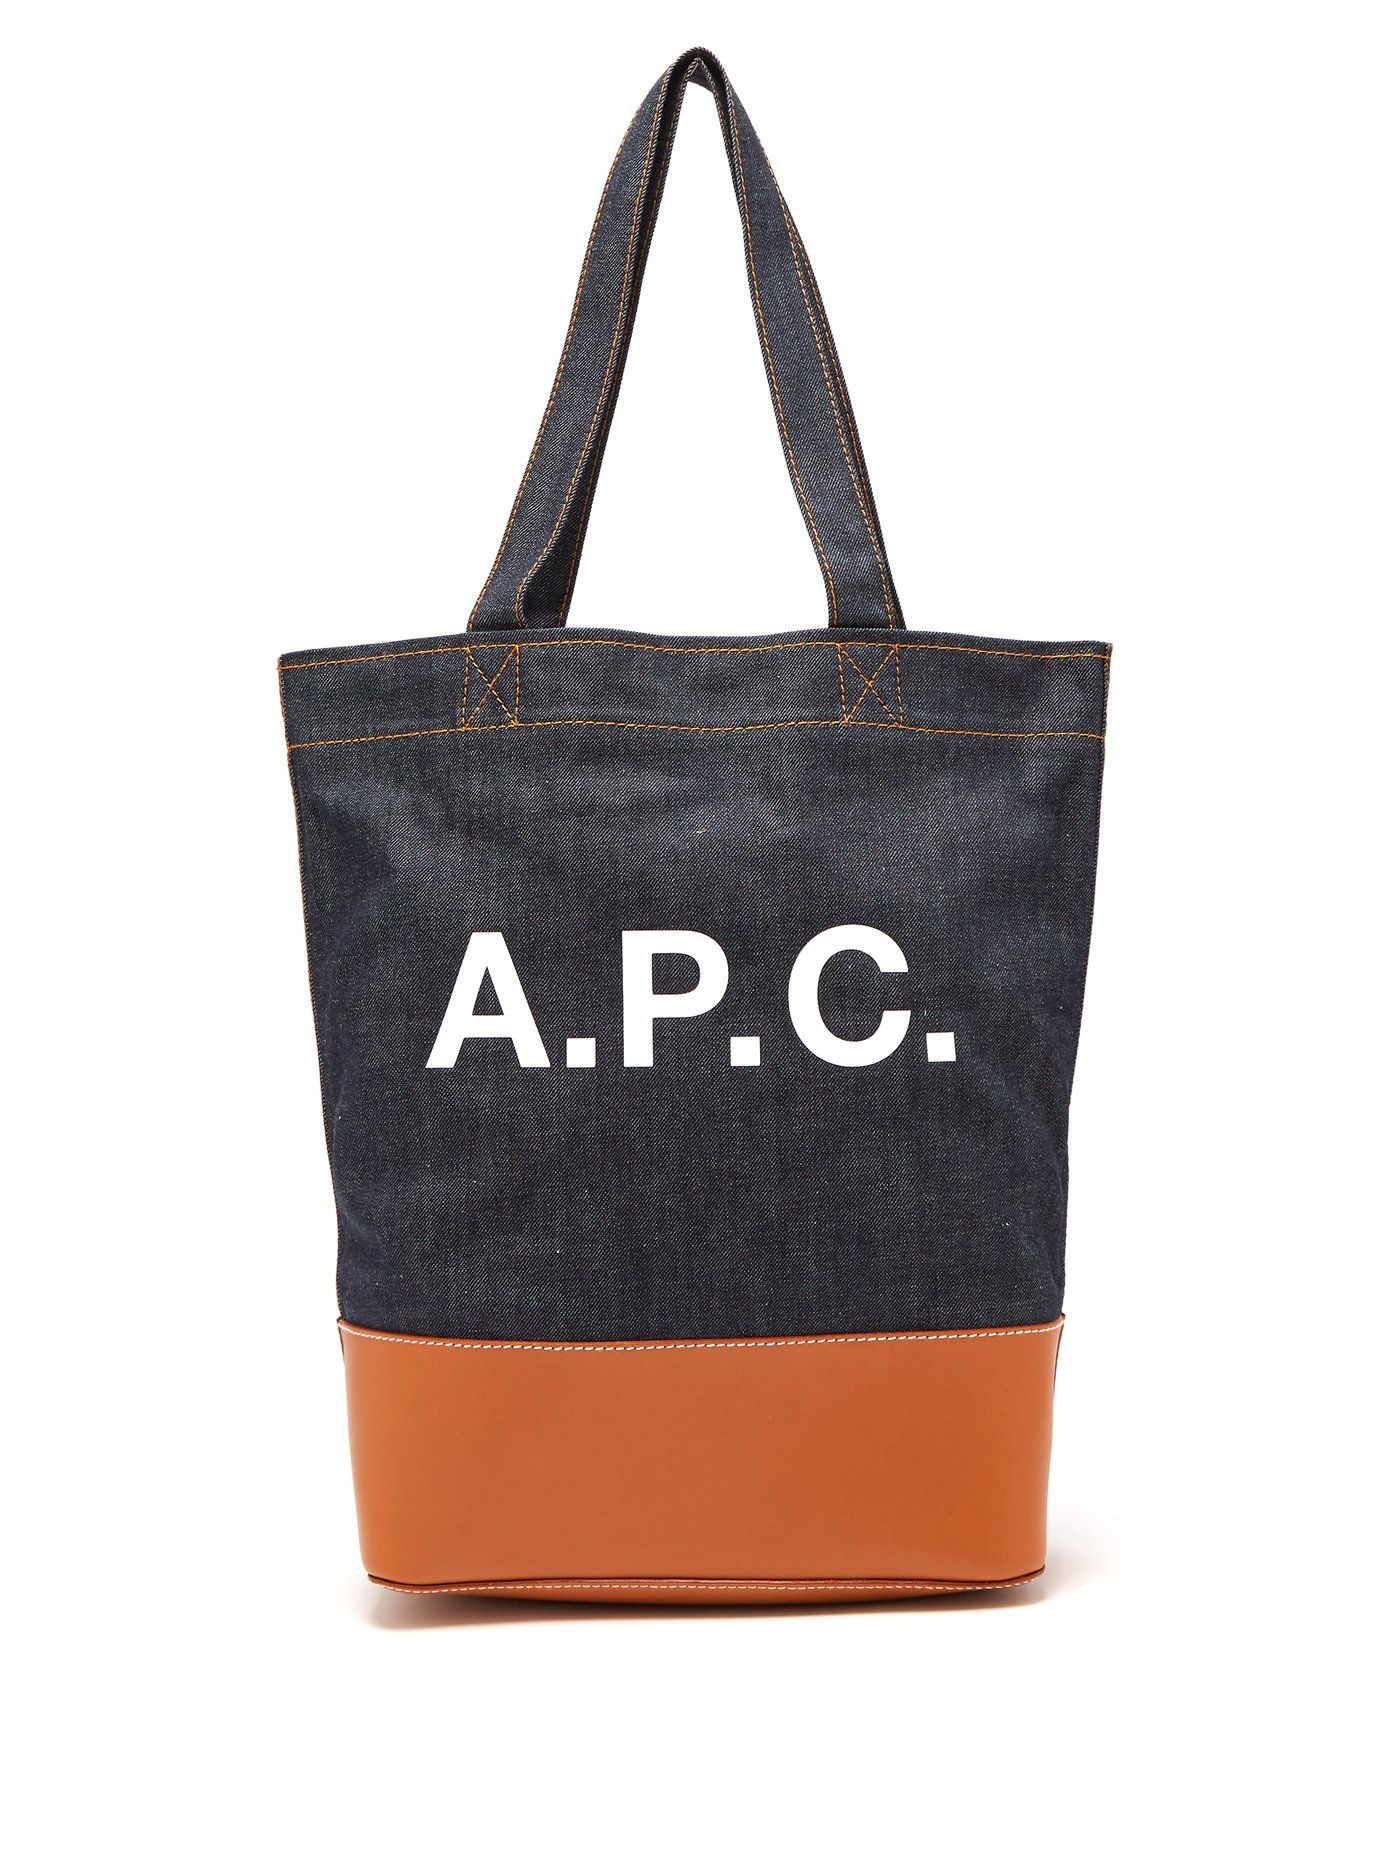 4fdc49c3b3 A.P.C. Axel tote bag